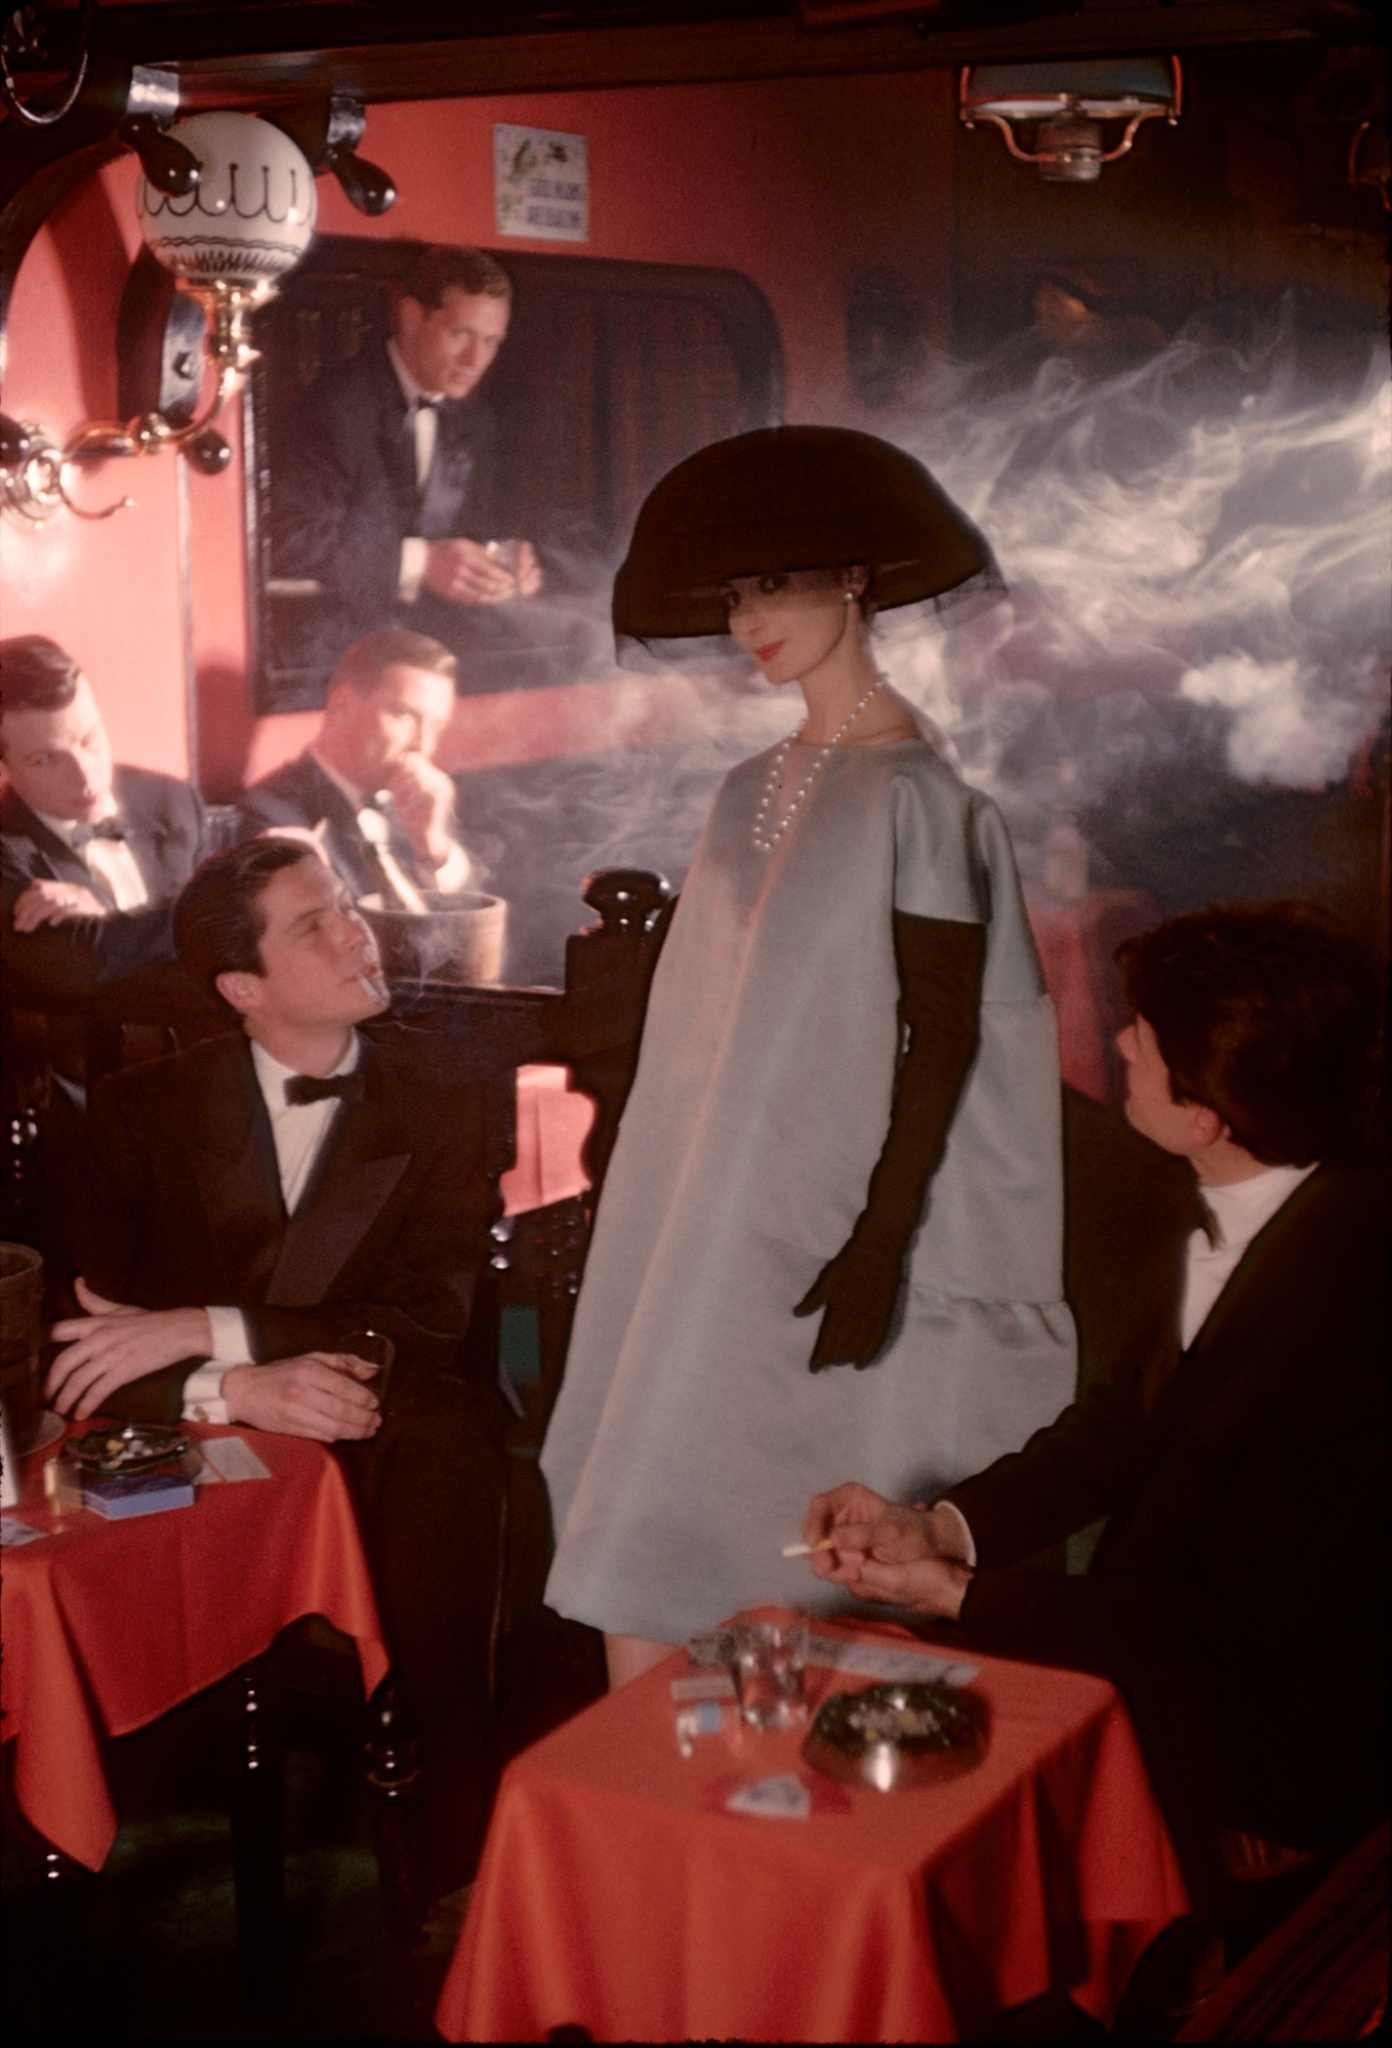 Paris, for Jardin des Modes, Givenchy dress at Crazy Horse Saloon